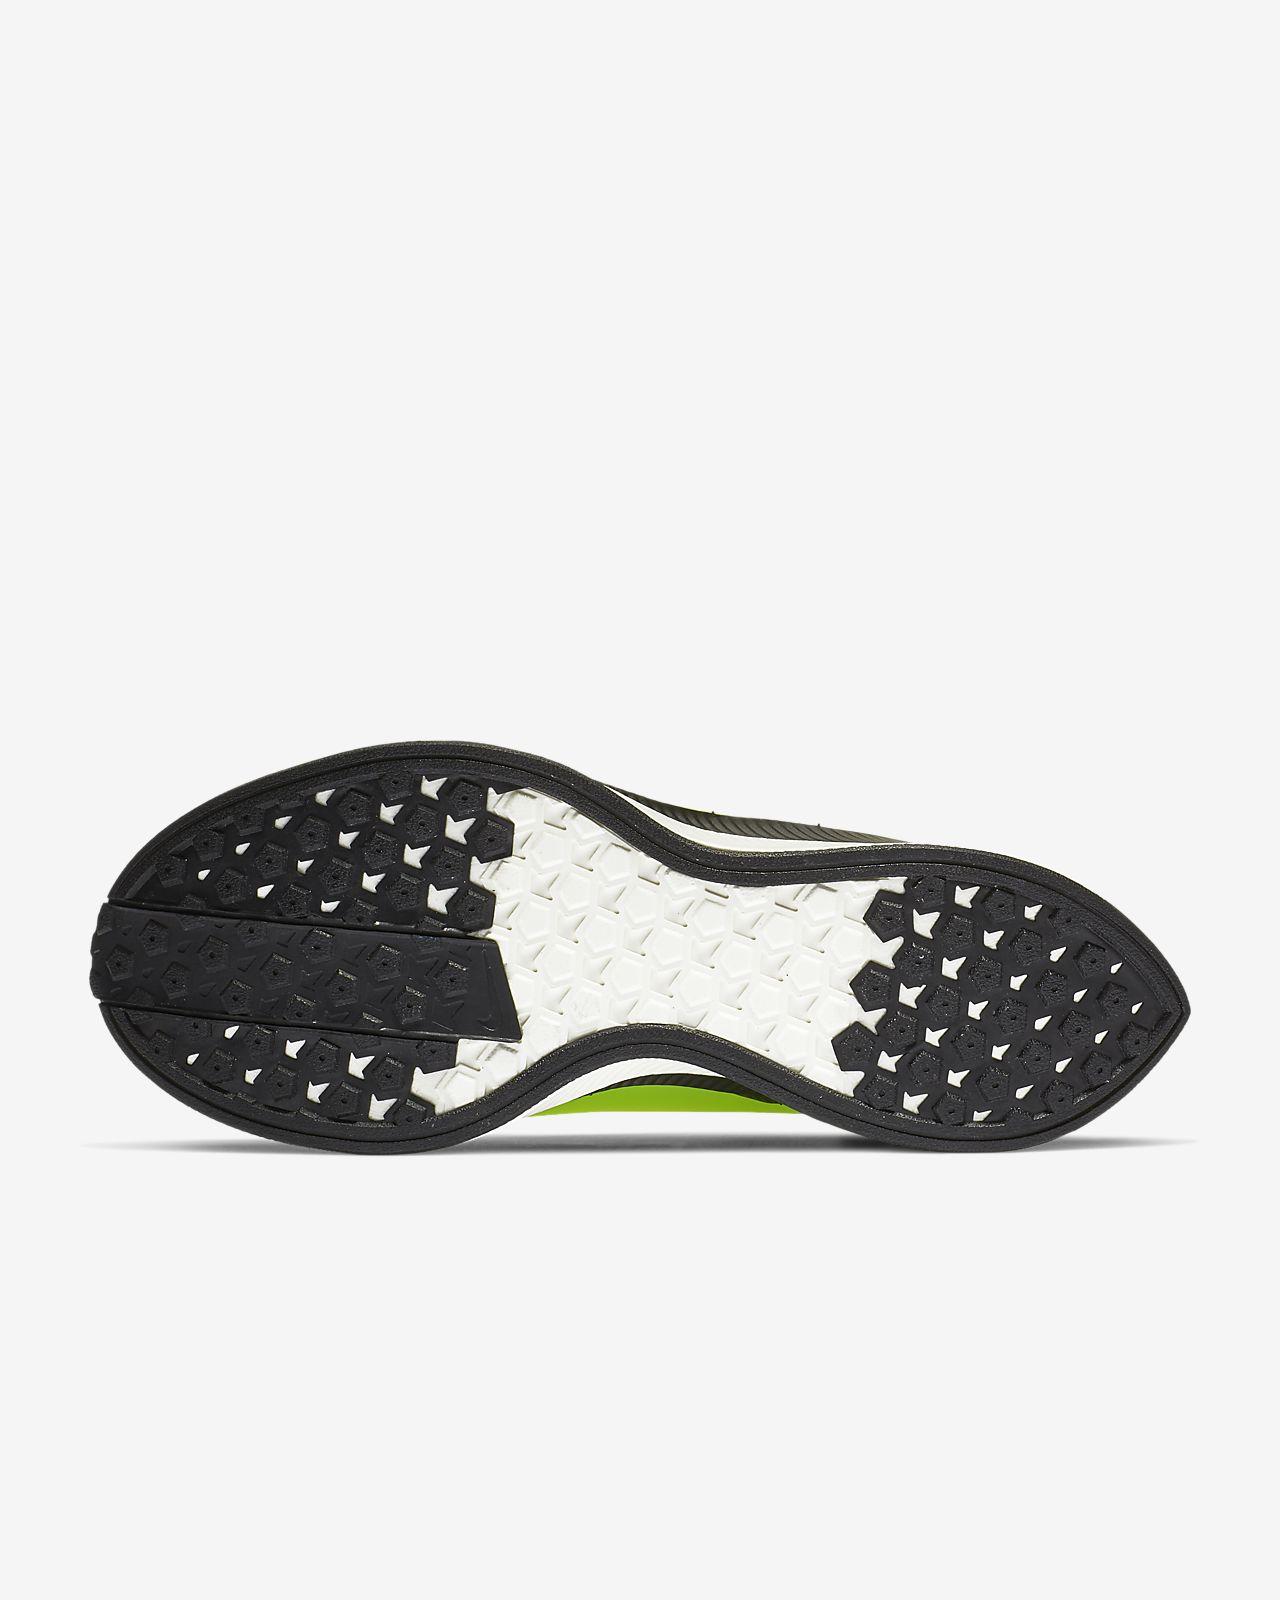 cheap for discount 3dc7e d1123 ... Löparsko Nike Zoom Pegasus Turbo XX för kvinnor